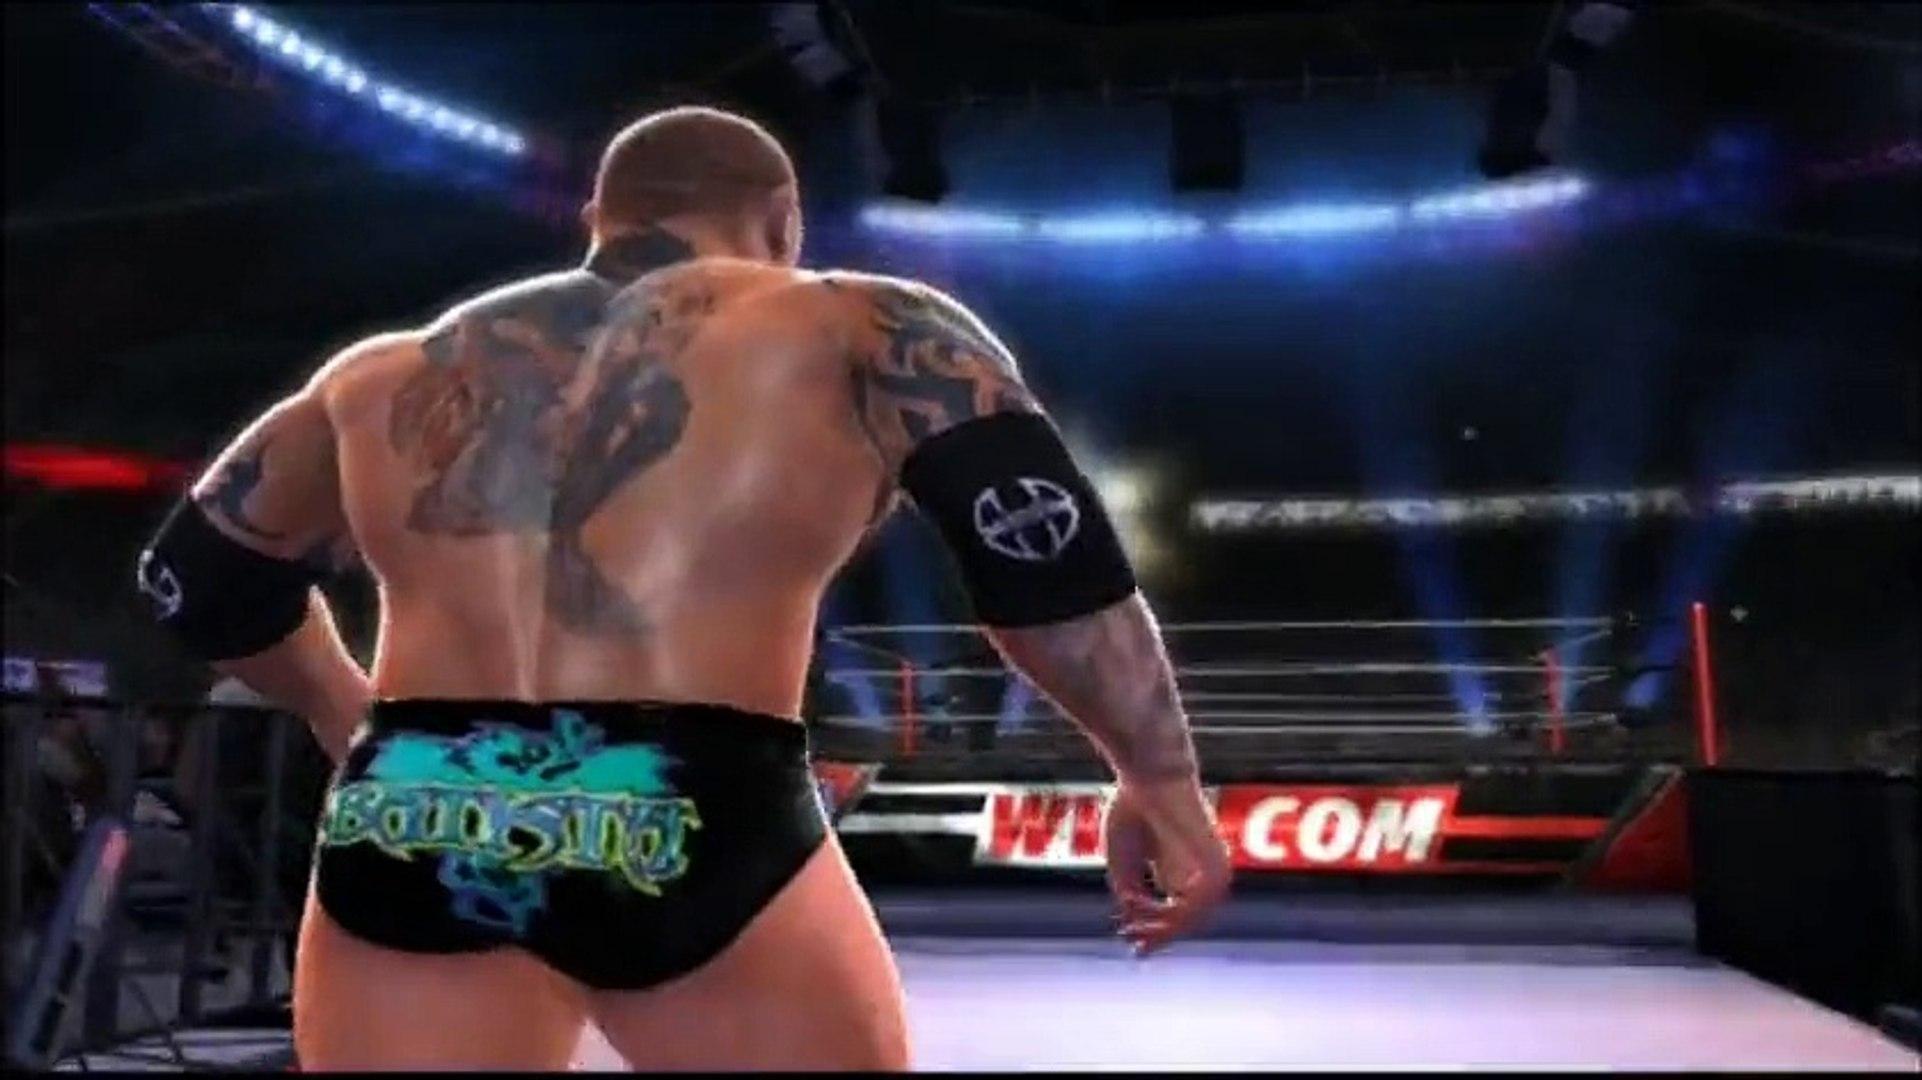 Hell in a Cell 2014 part 4 [Brock Lesnar vs Batista]